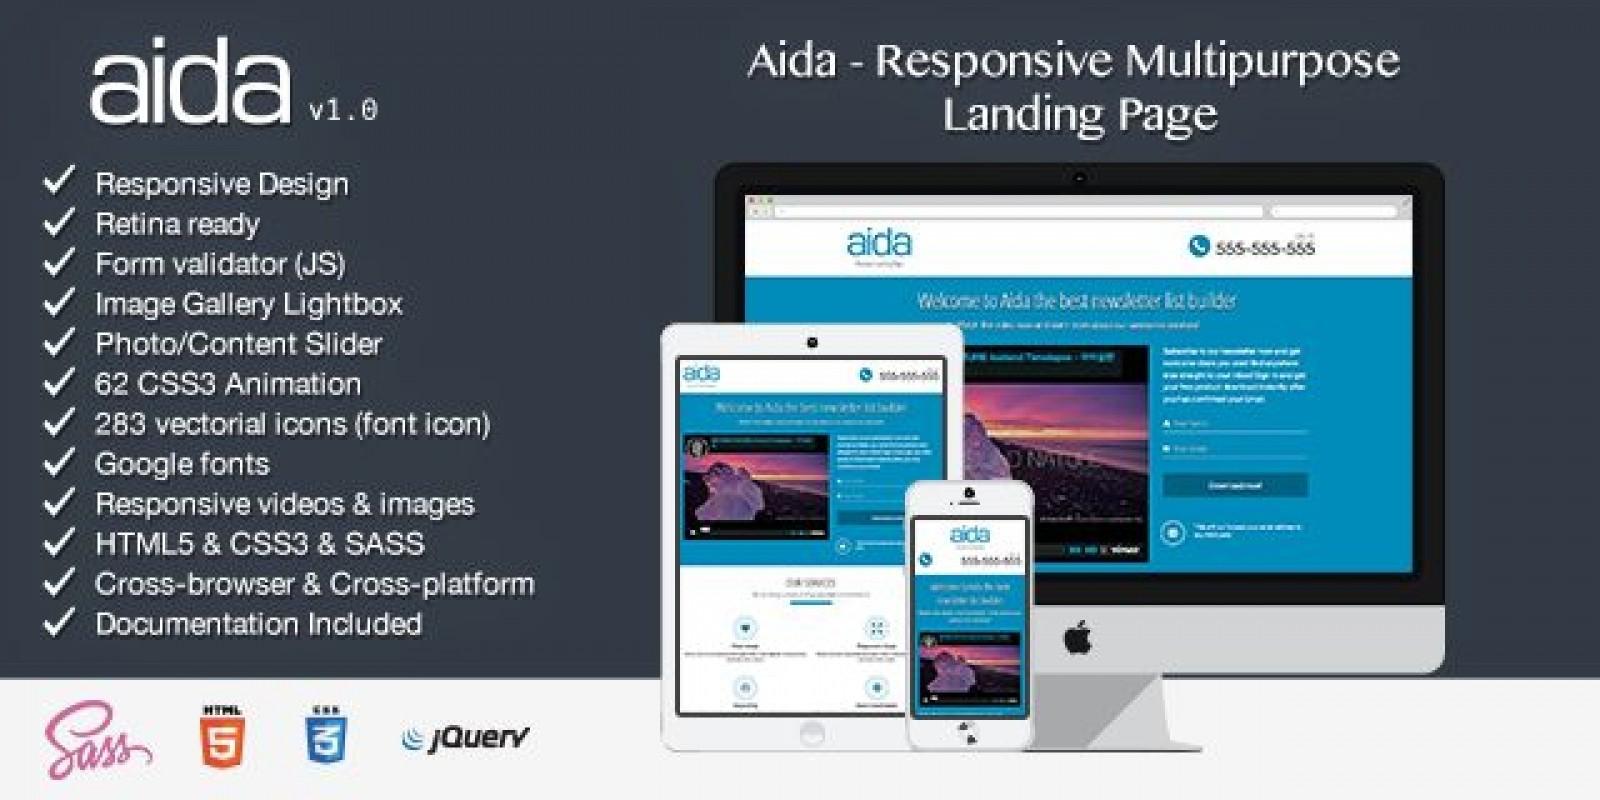 Aida - Responsive Multipurpose Landing Page